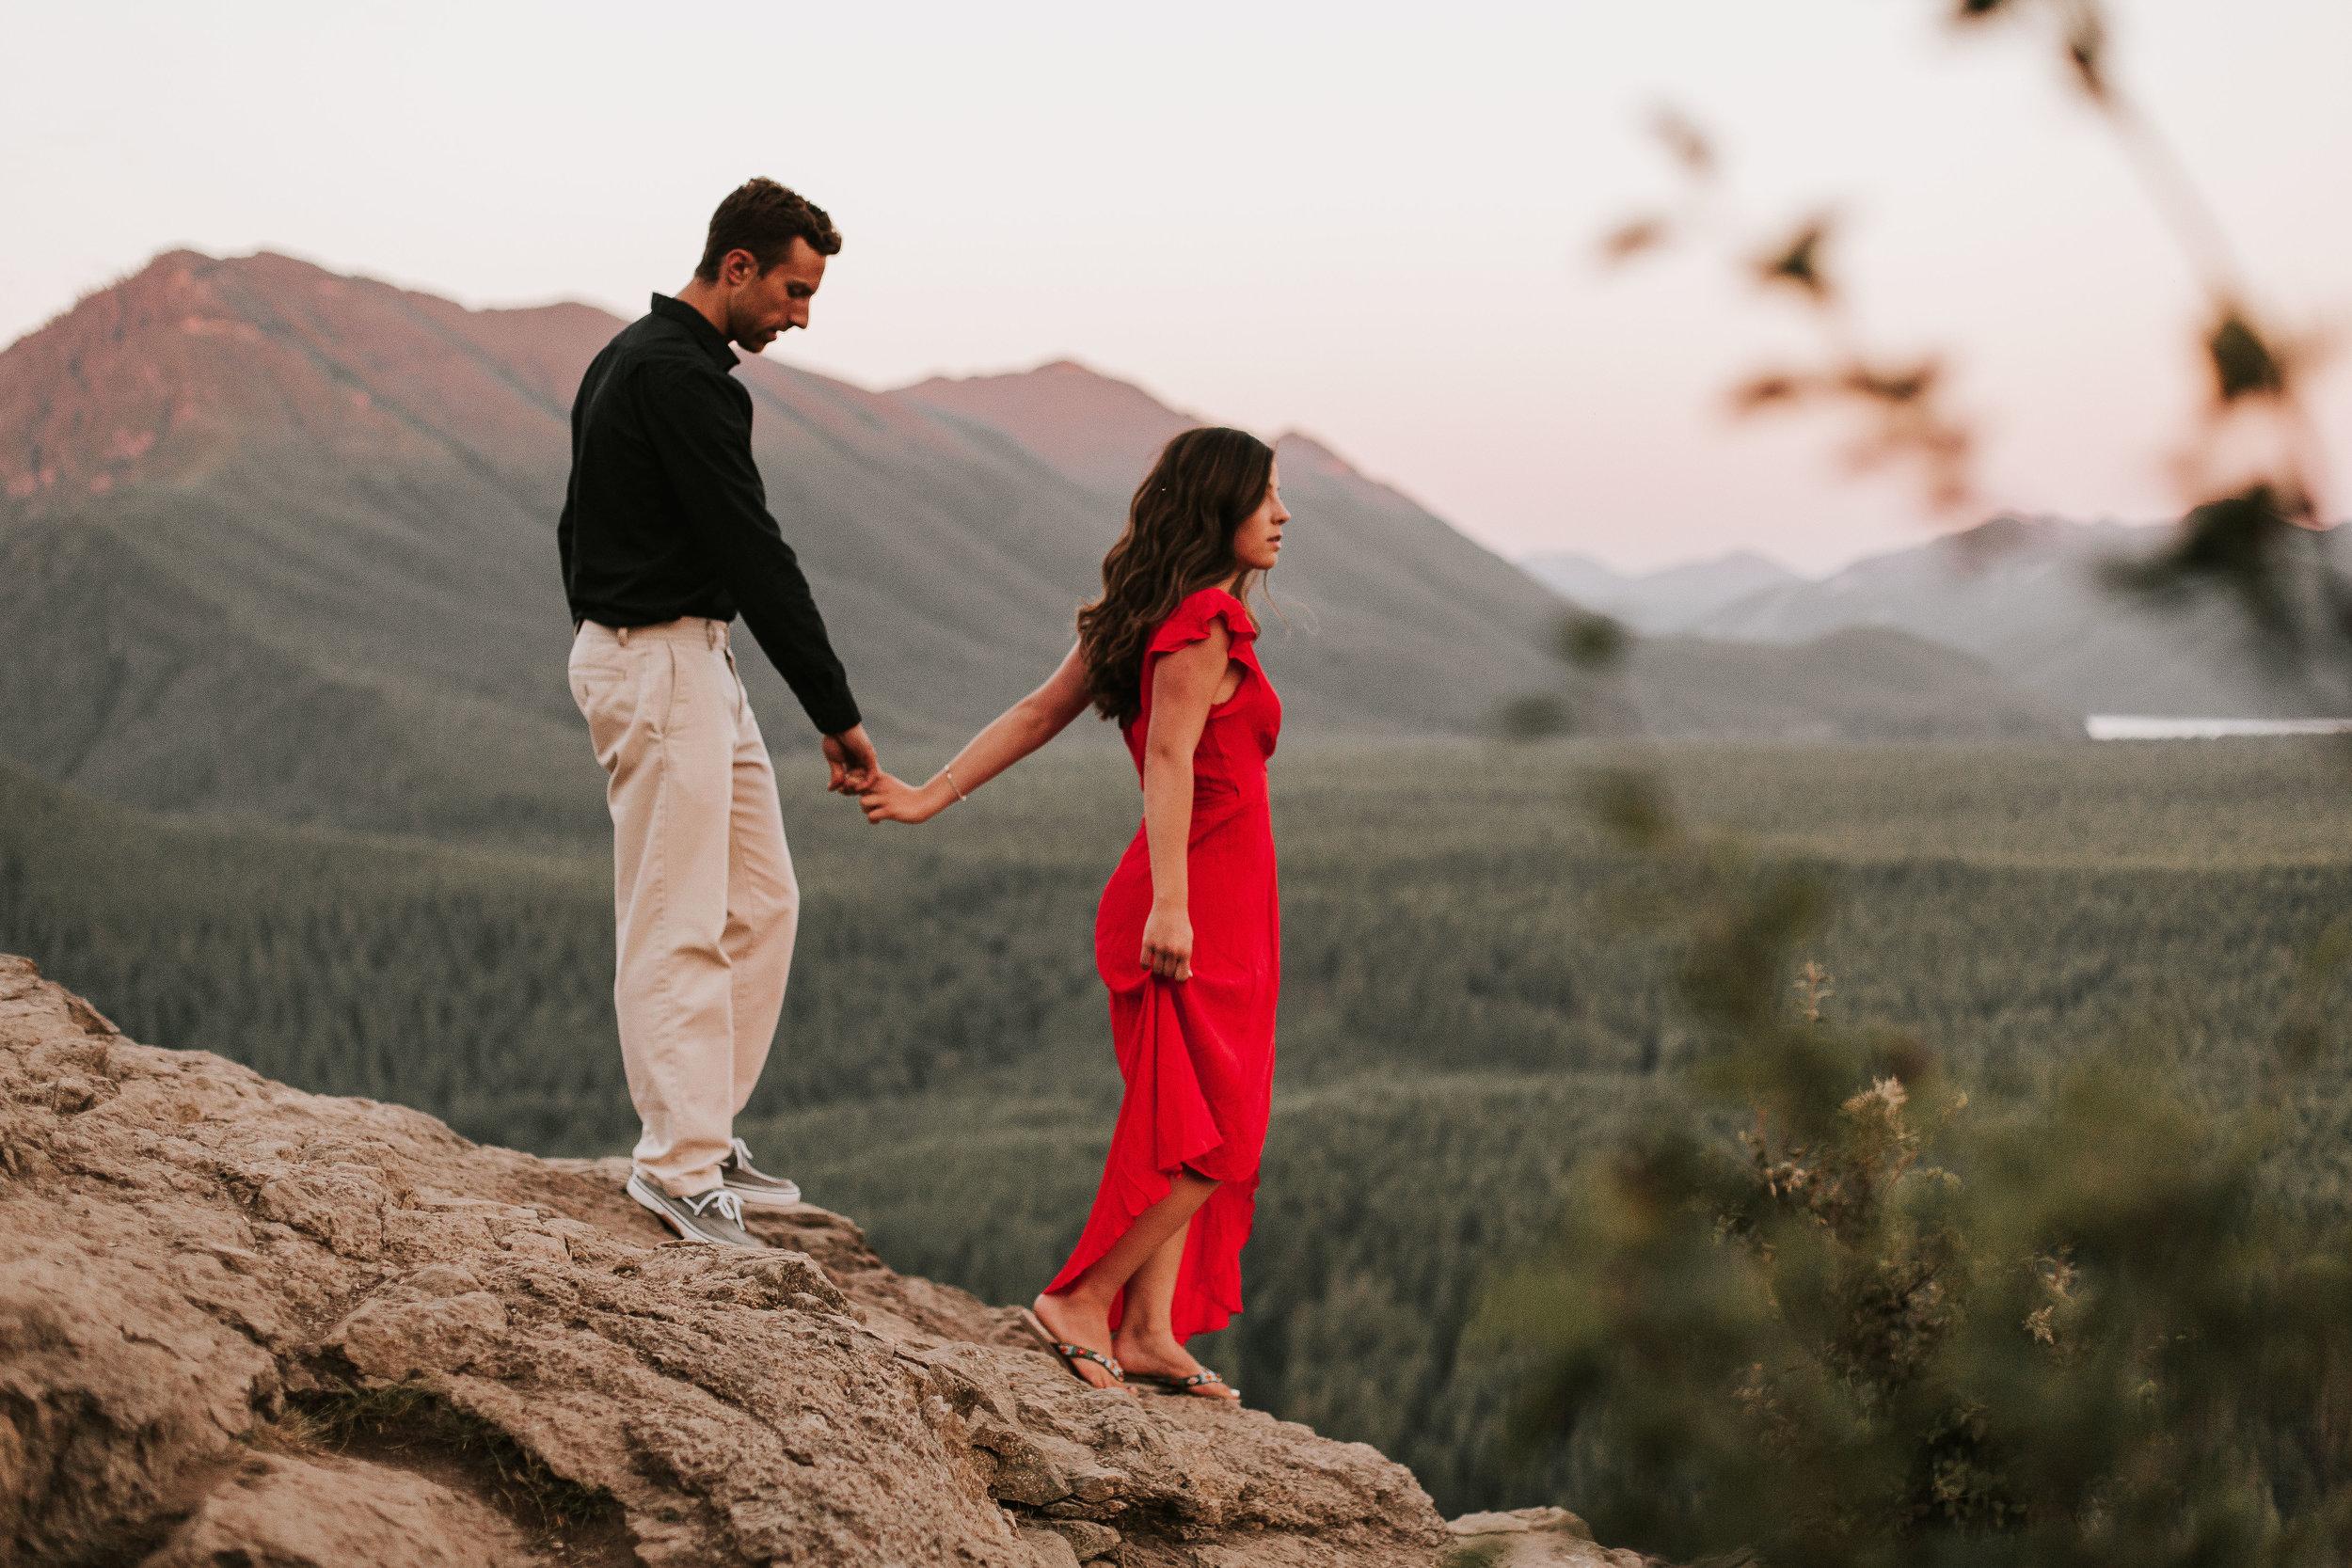 nicole-daacke-photography-rattlesnake-ridge-adventurous-engagement-session-hiking-seattle-washington-destinatino-elopement-intimate-wedding-photographer-31.jpg